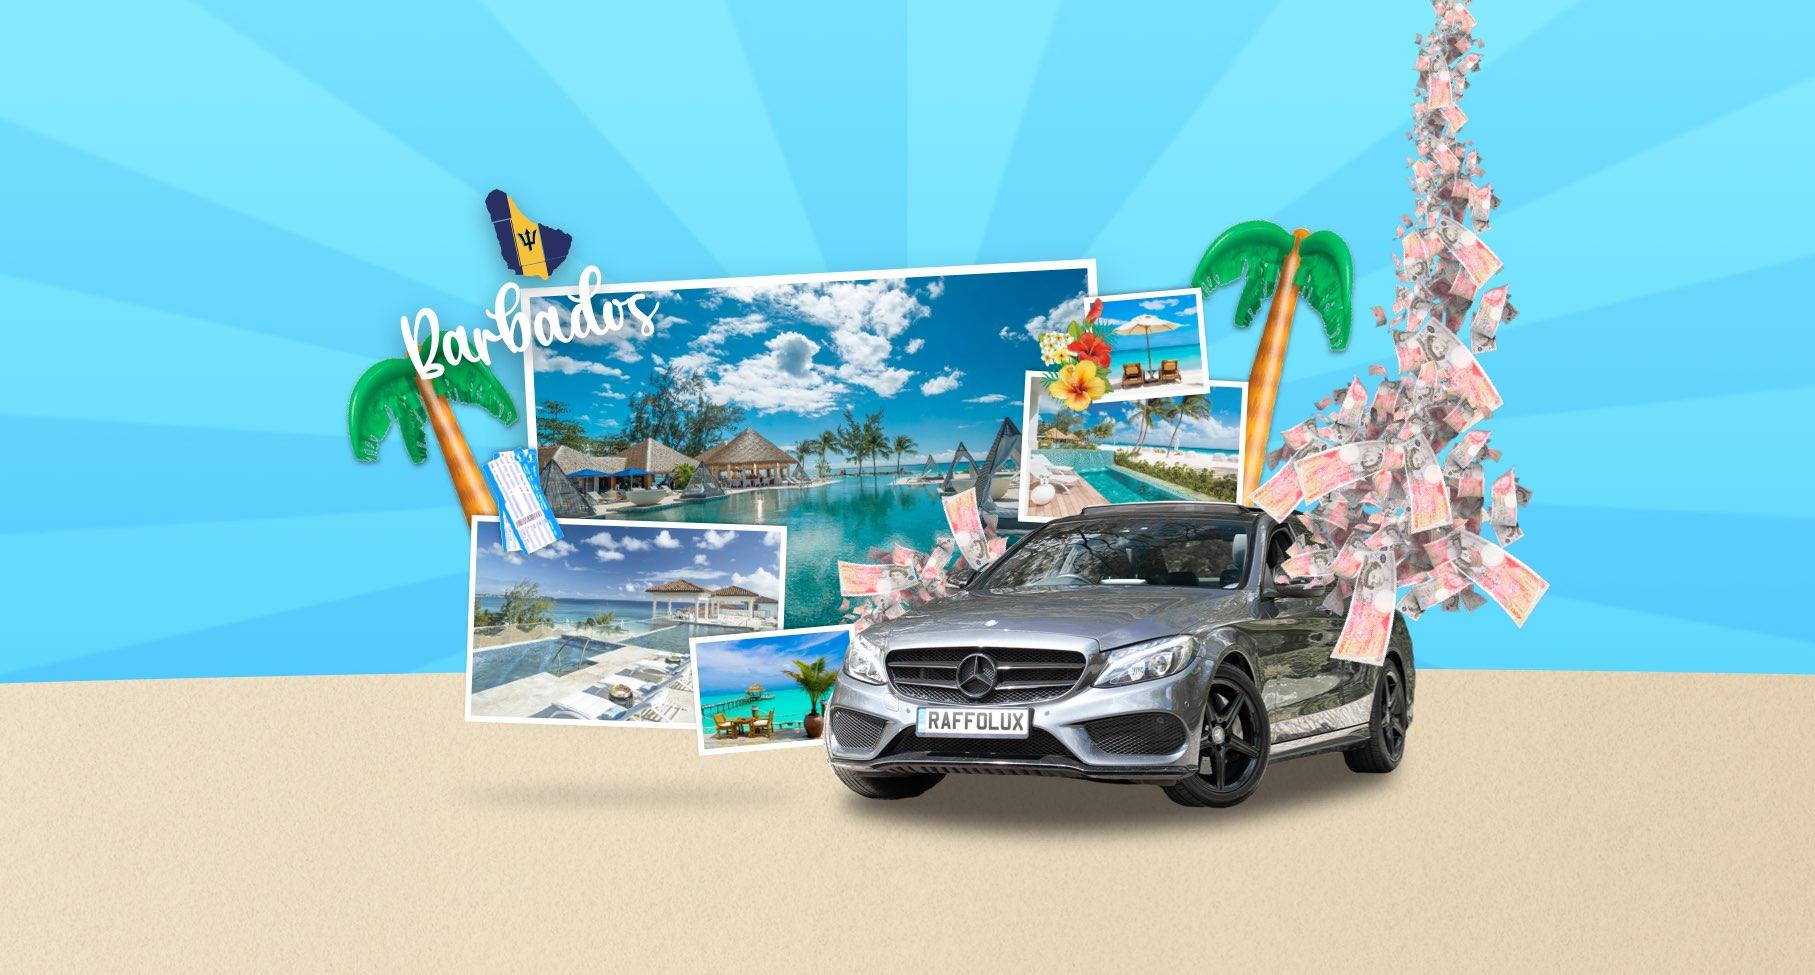 Mercedes OR Barbados OR £15k